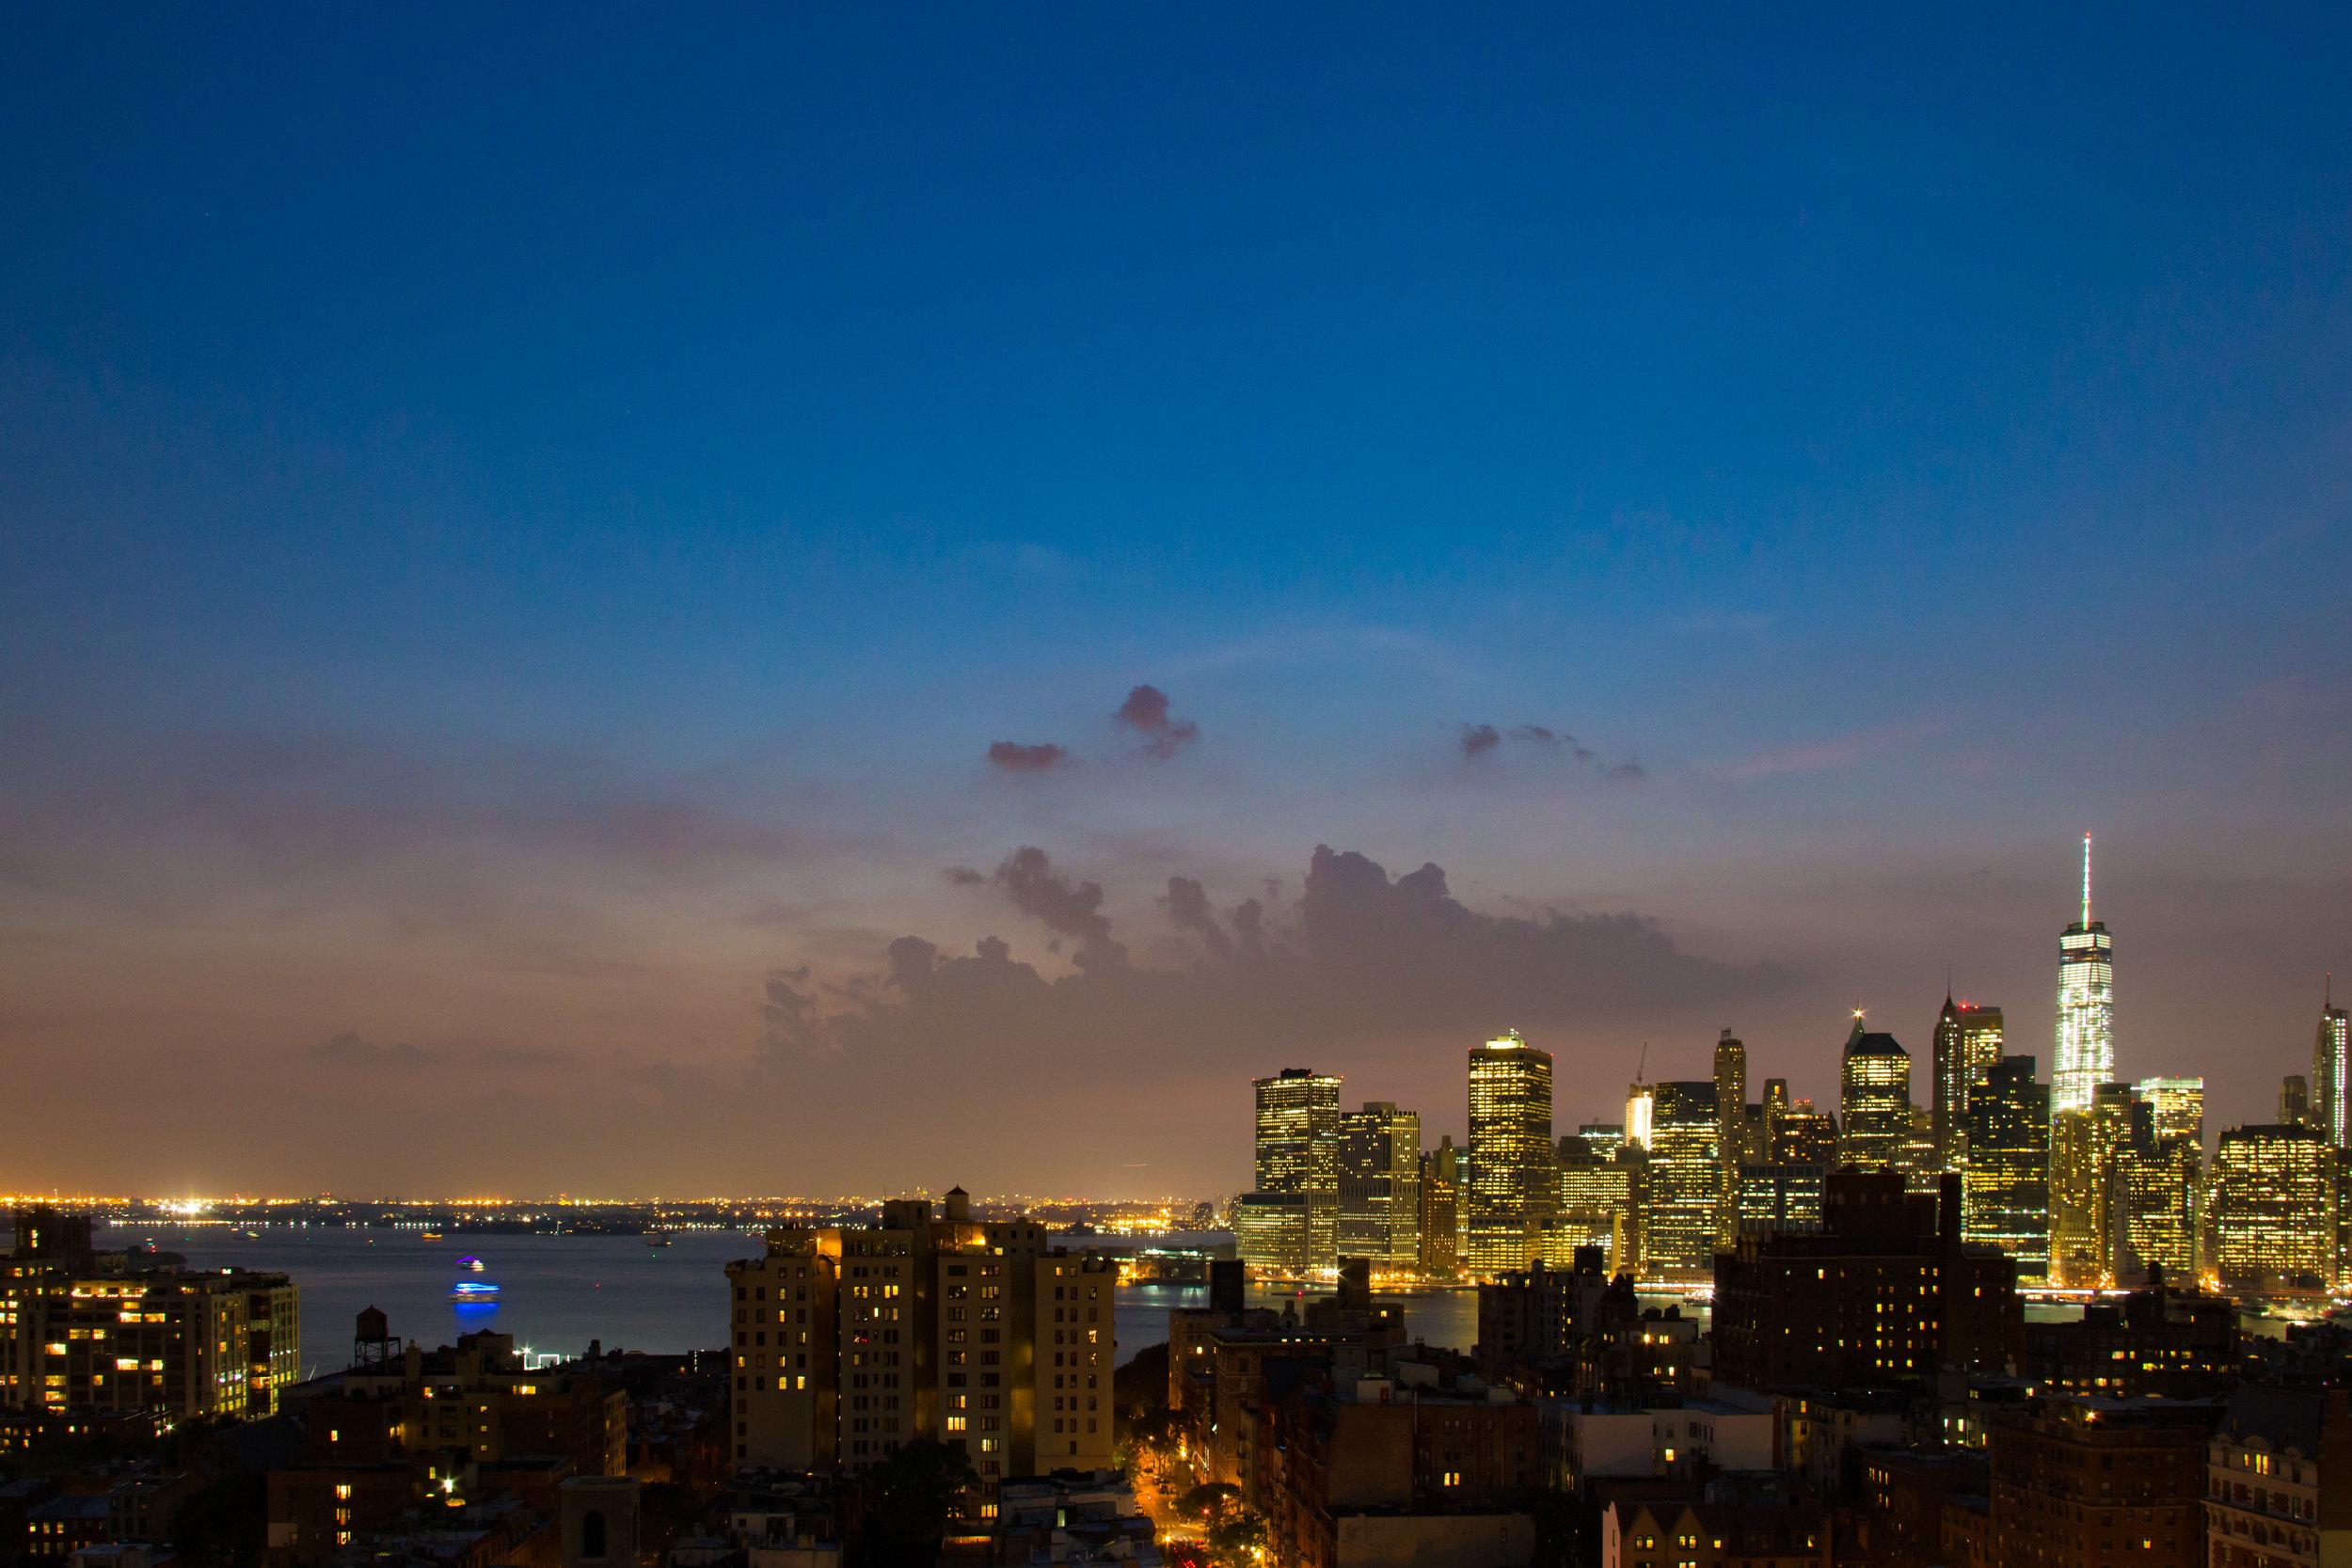 LSNY_Night_City_Views-37.jpg